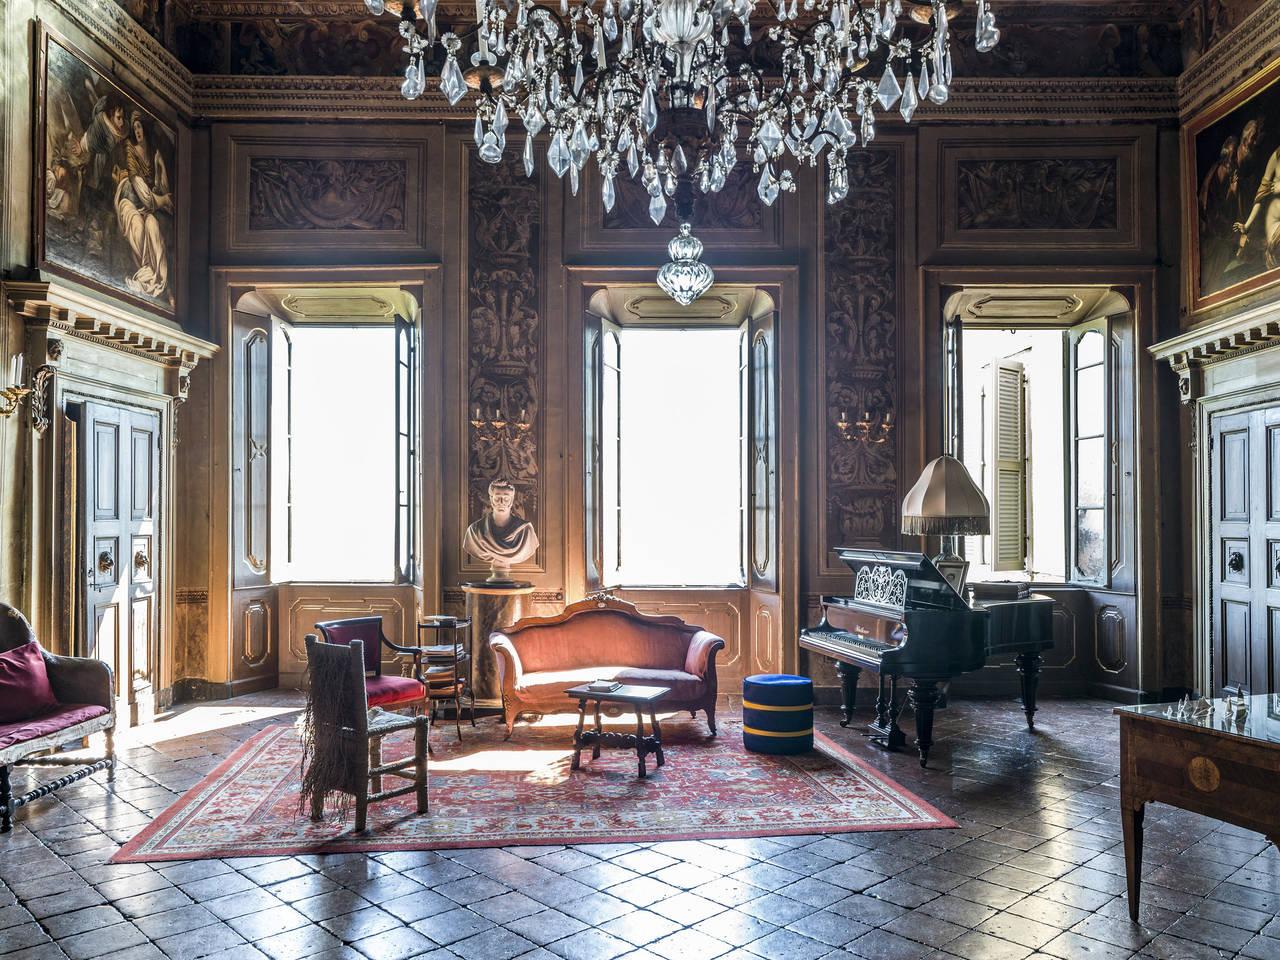 Palazzo Terzi, Bergamo. ©Ezio Manciucca